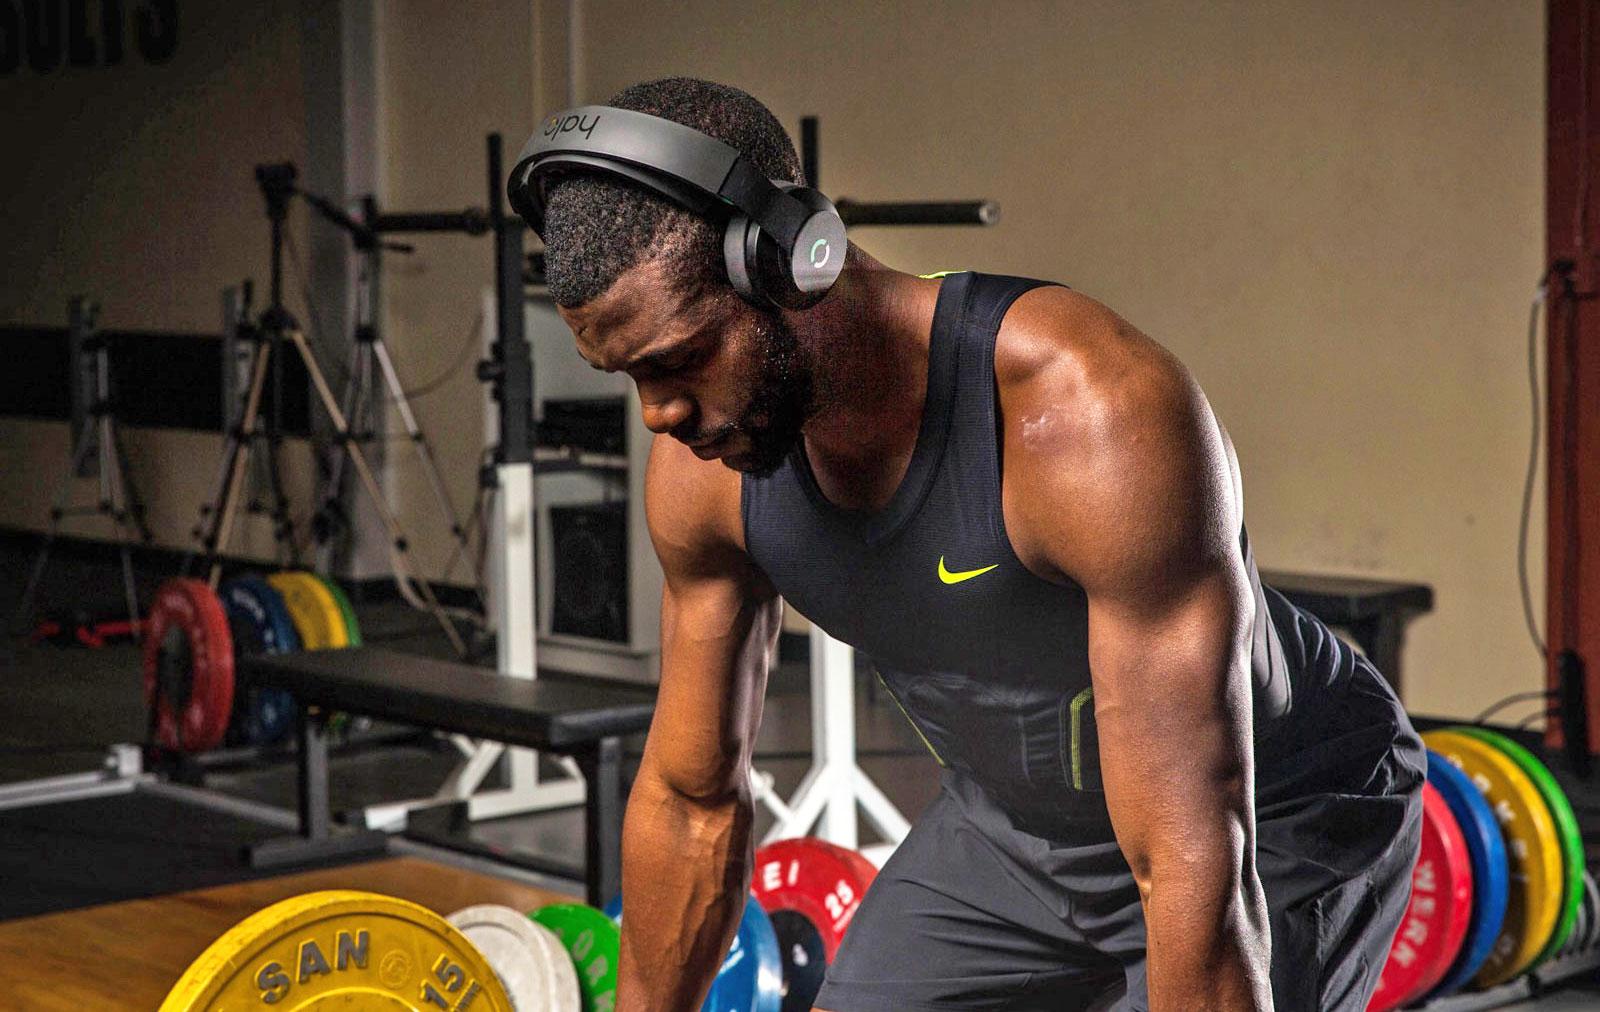 Halo brain stimulation headphones Olympic athletes